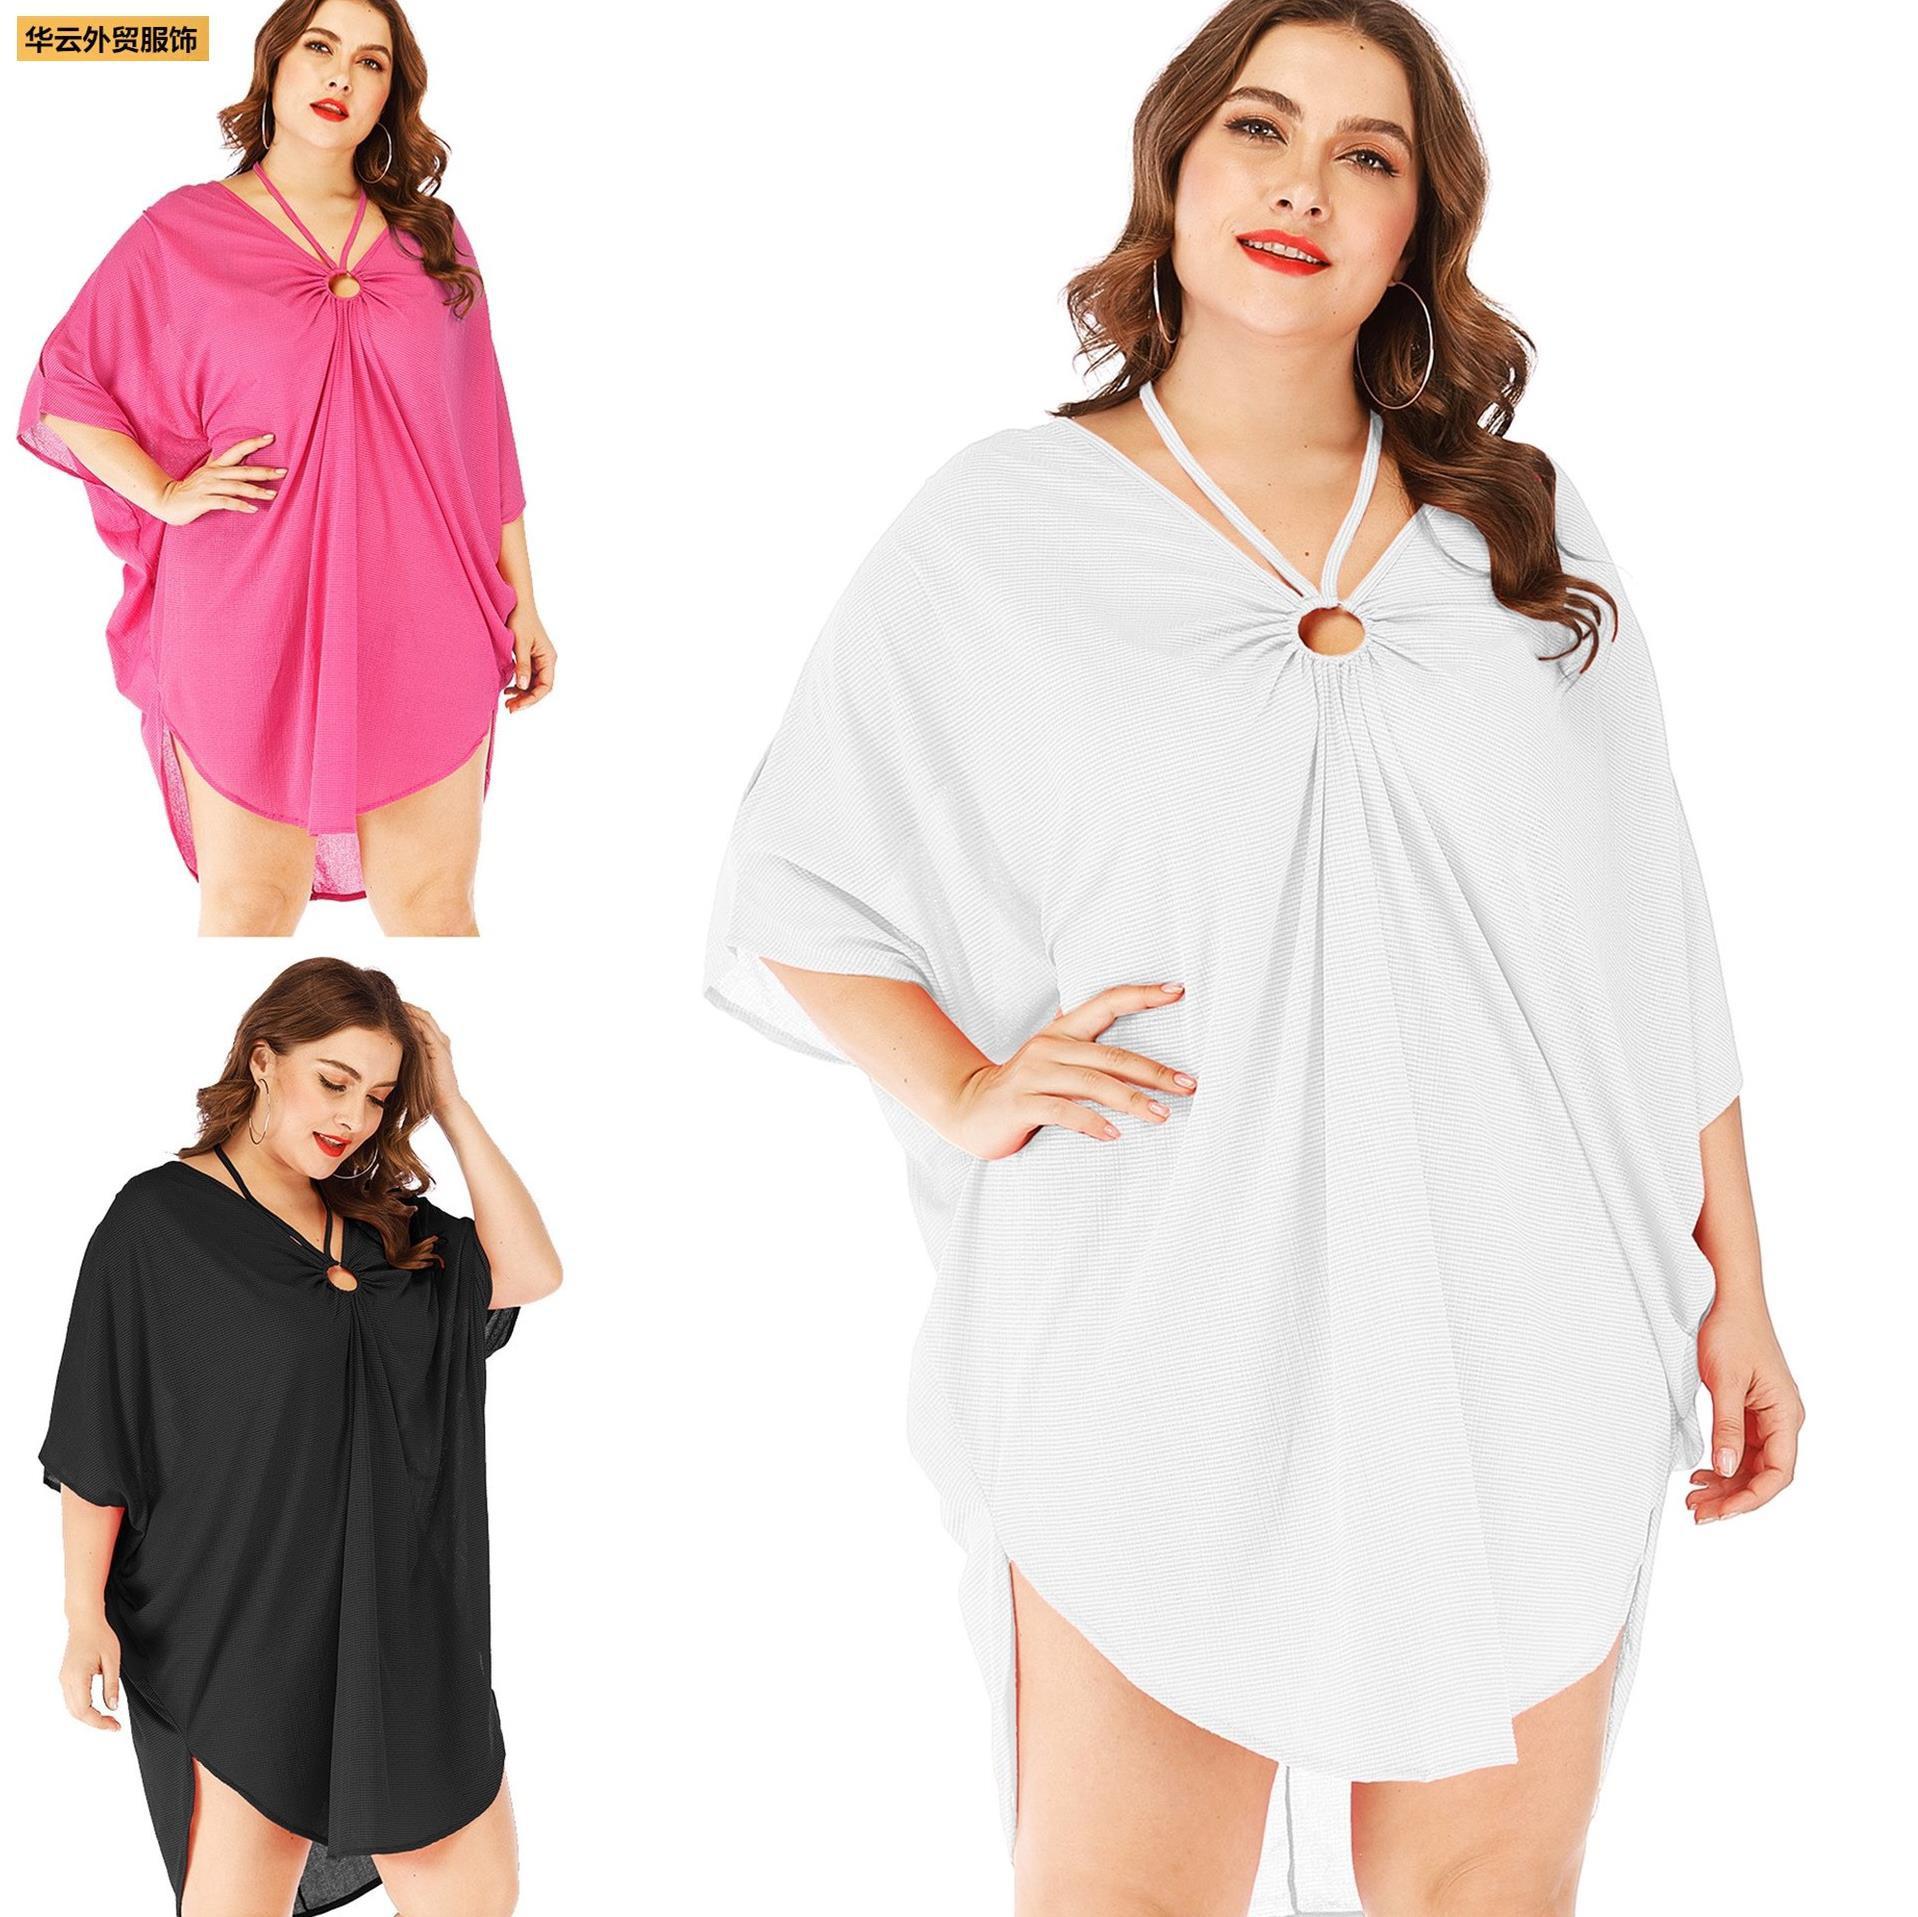 Irregular blouse deep V halter plus size women's dress罩衫女